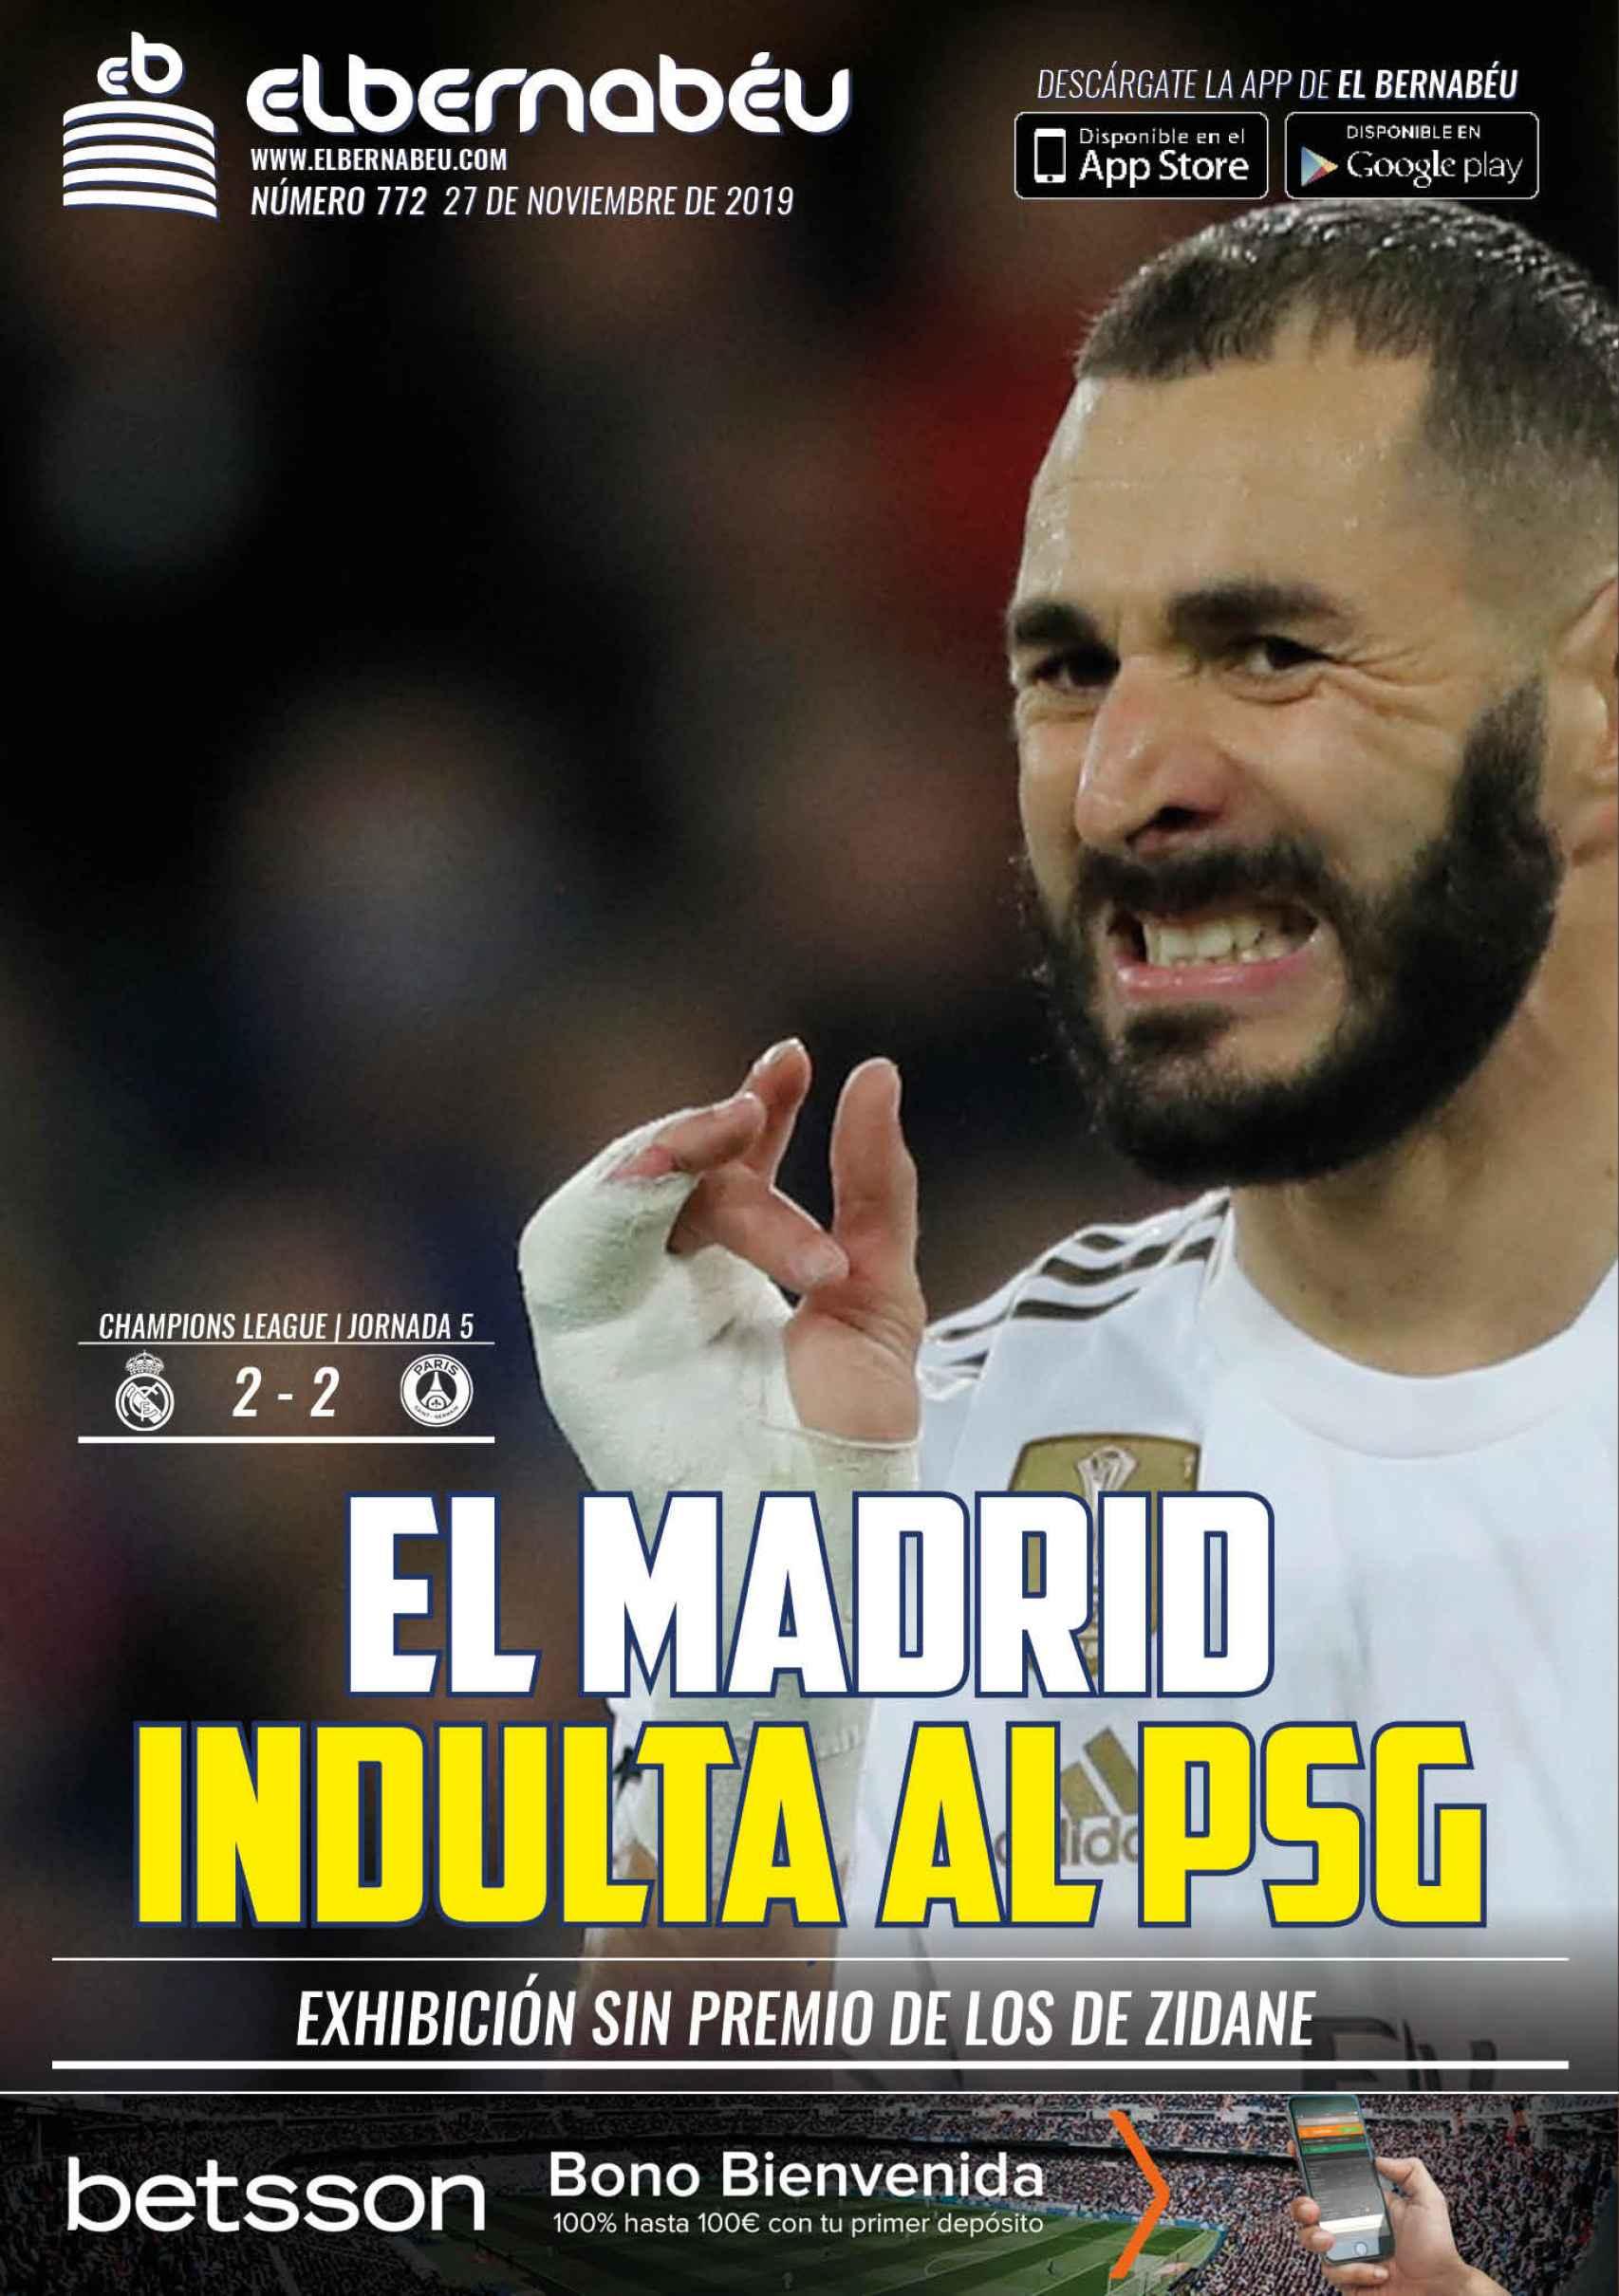 La portada de El Bernabéu (27/11/2019)